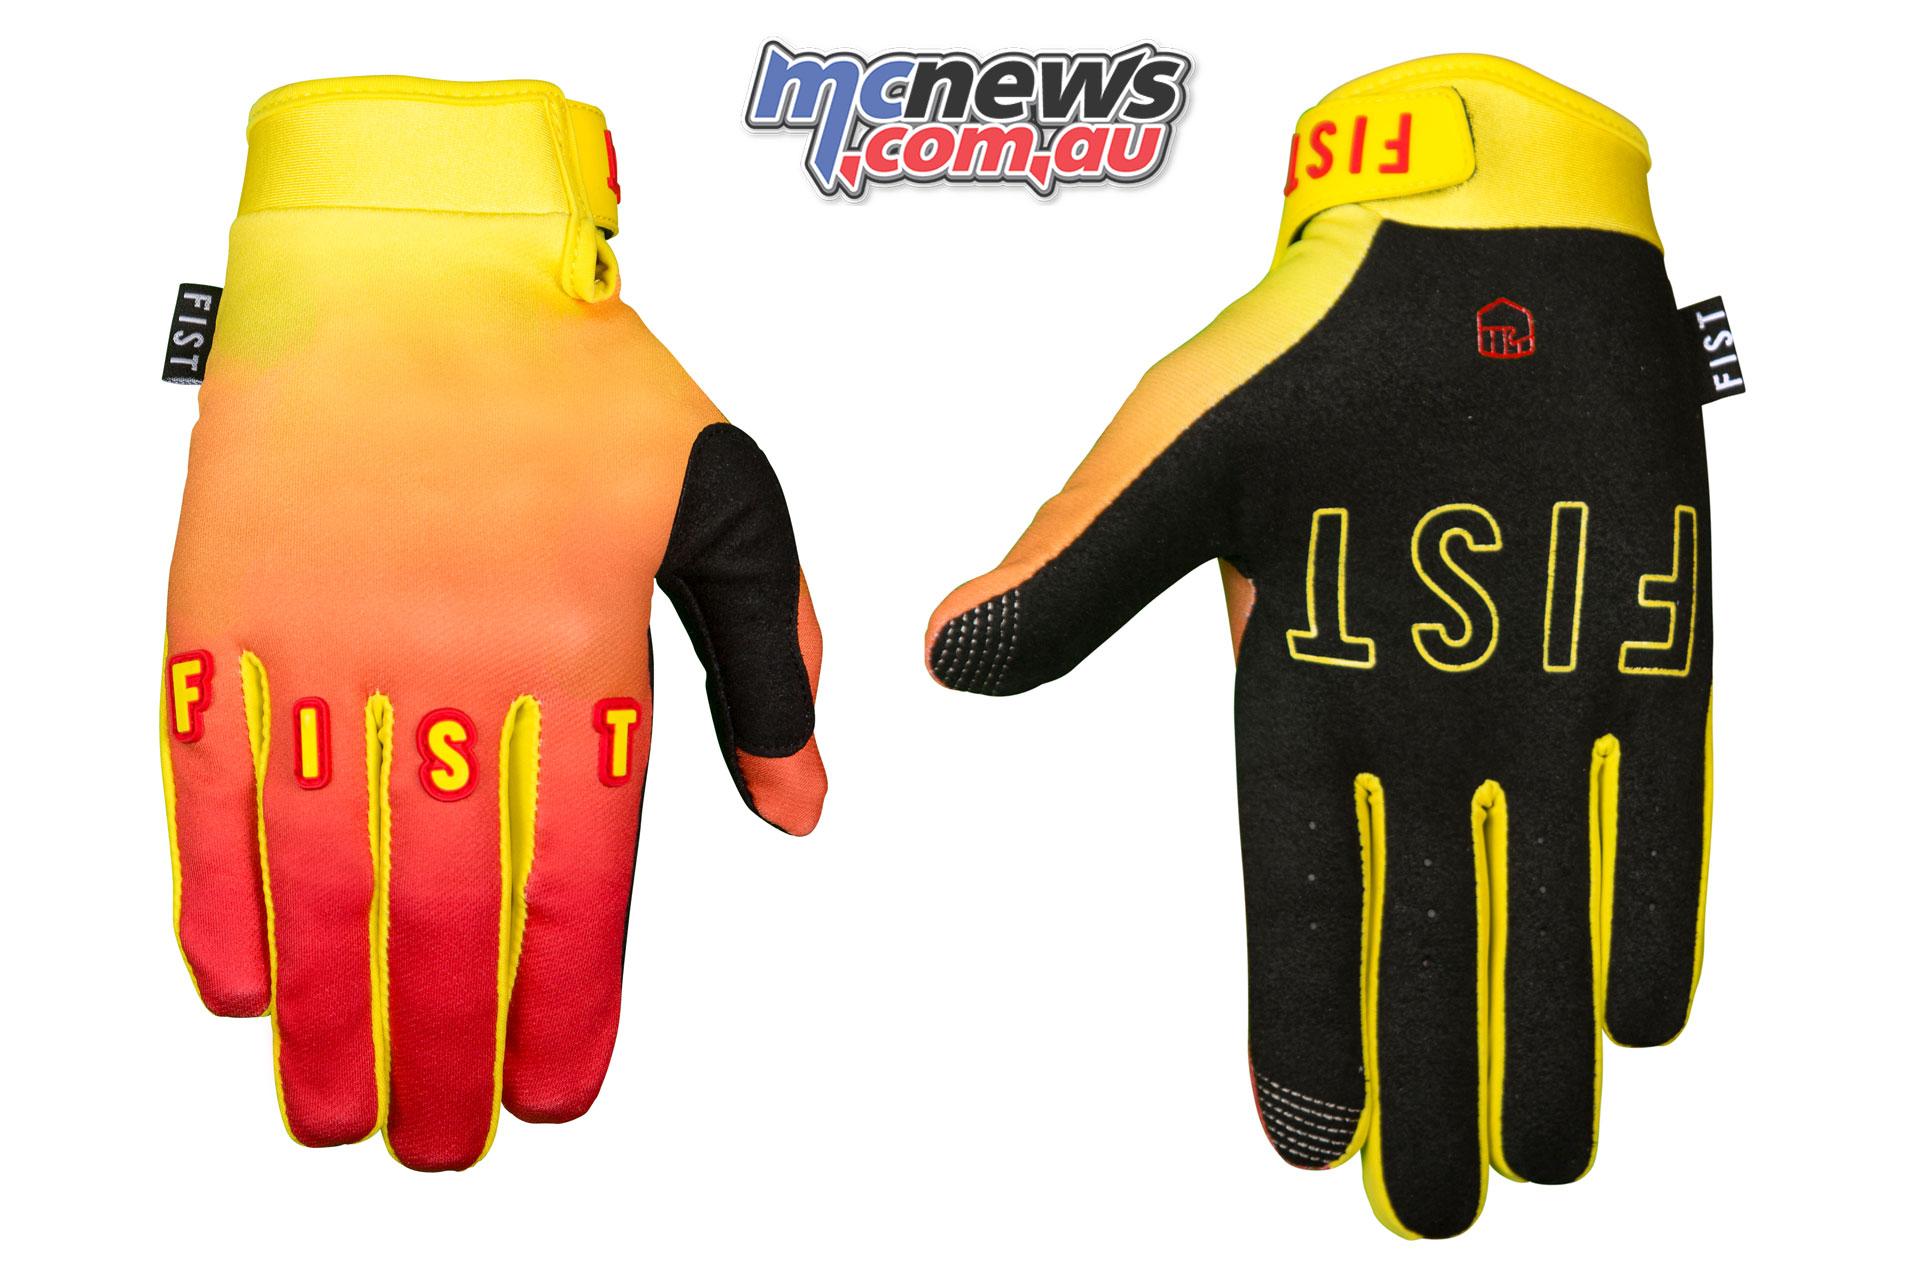 Fist Handwear Spring SUNRISE Back